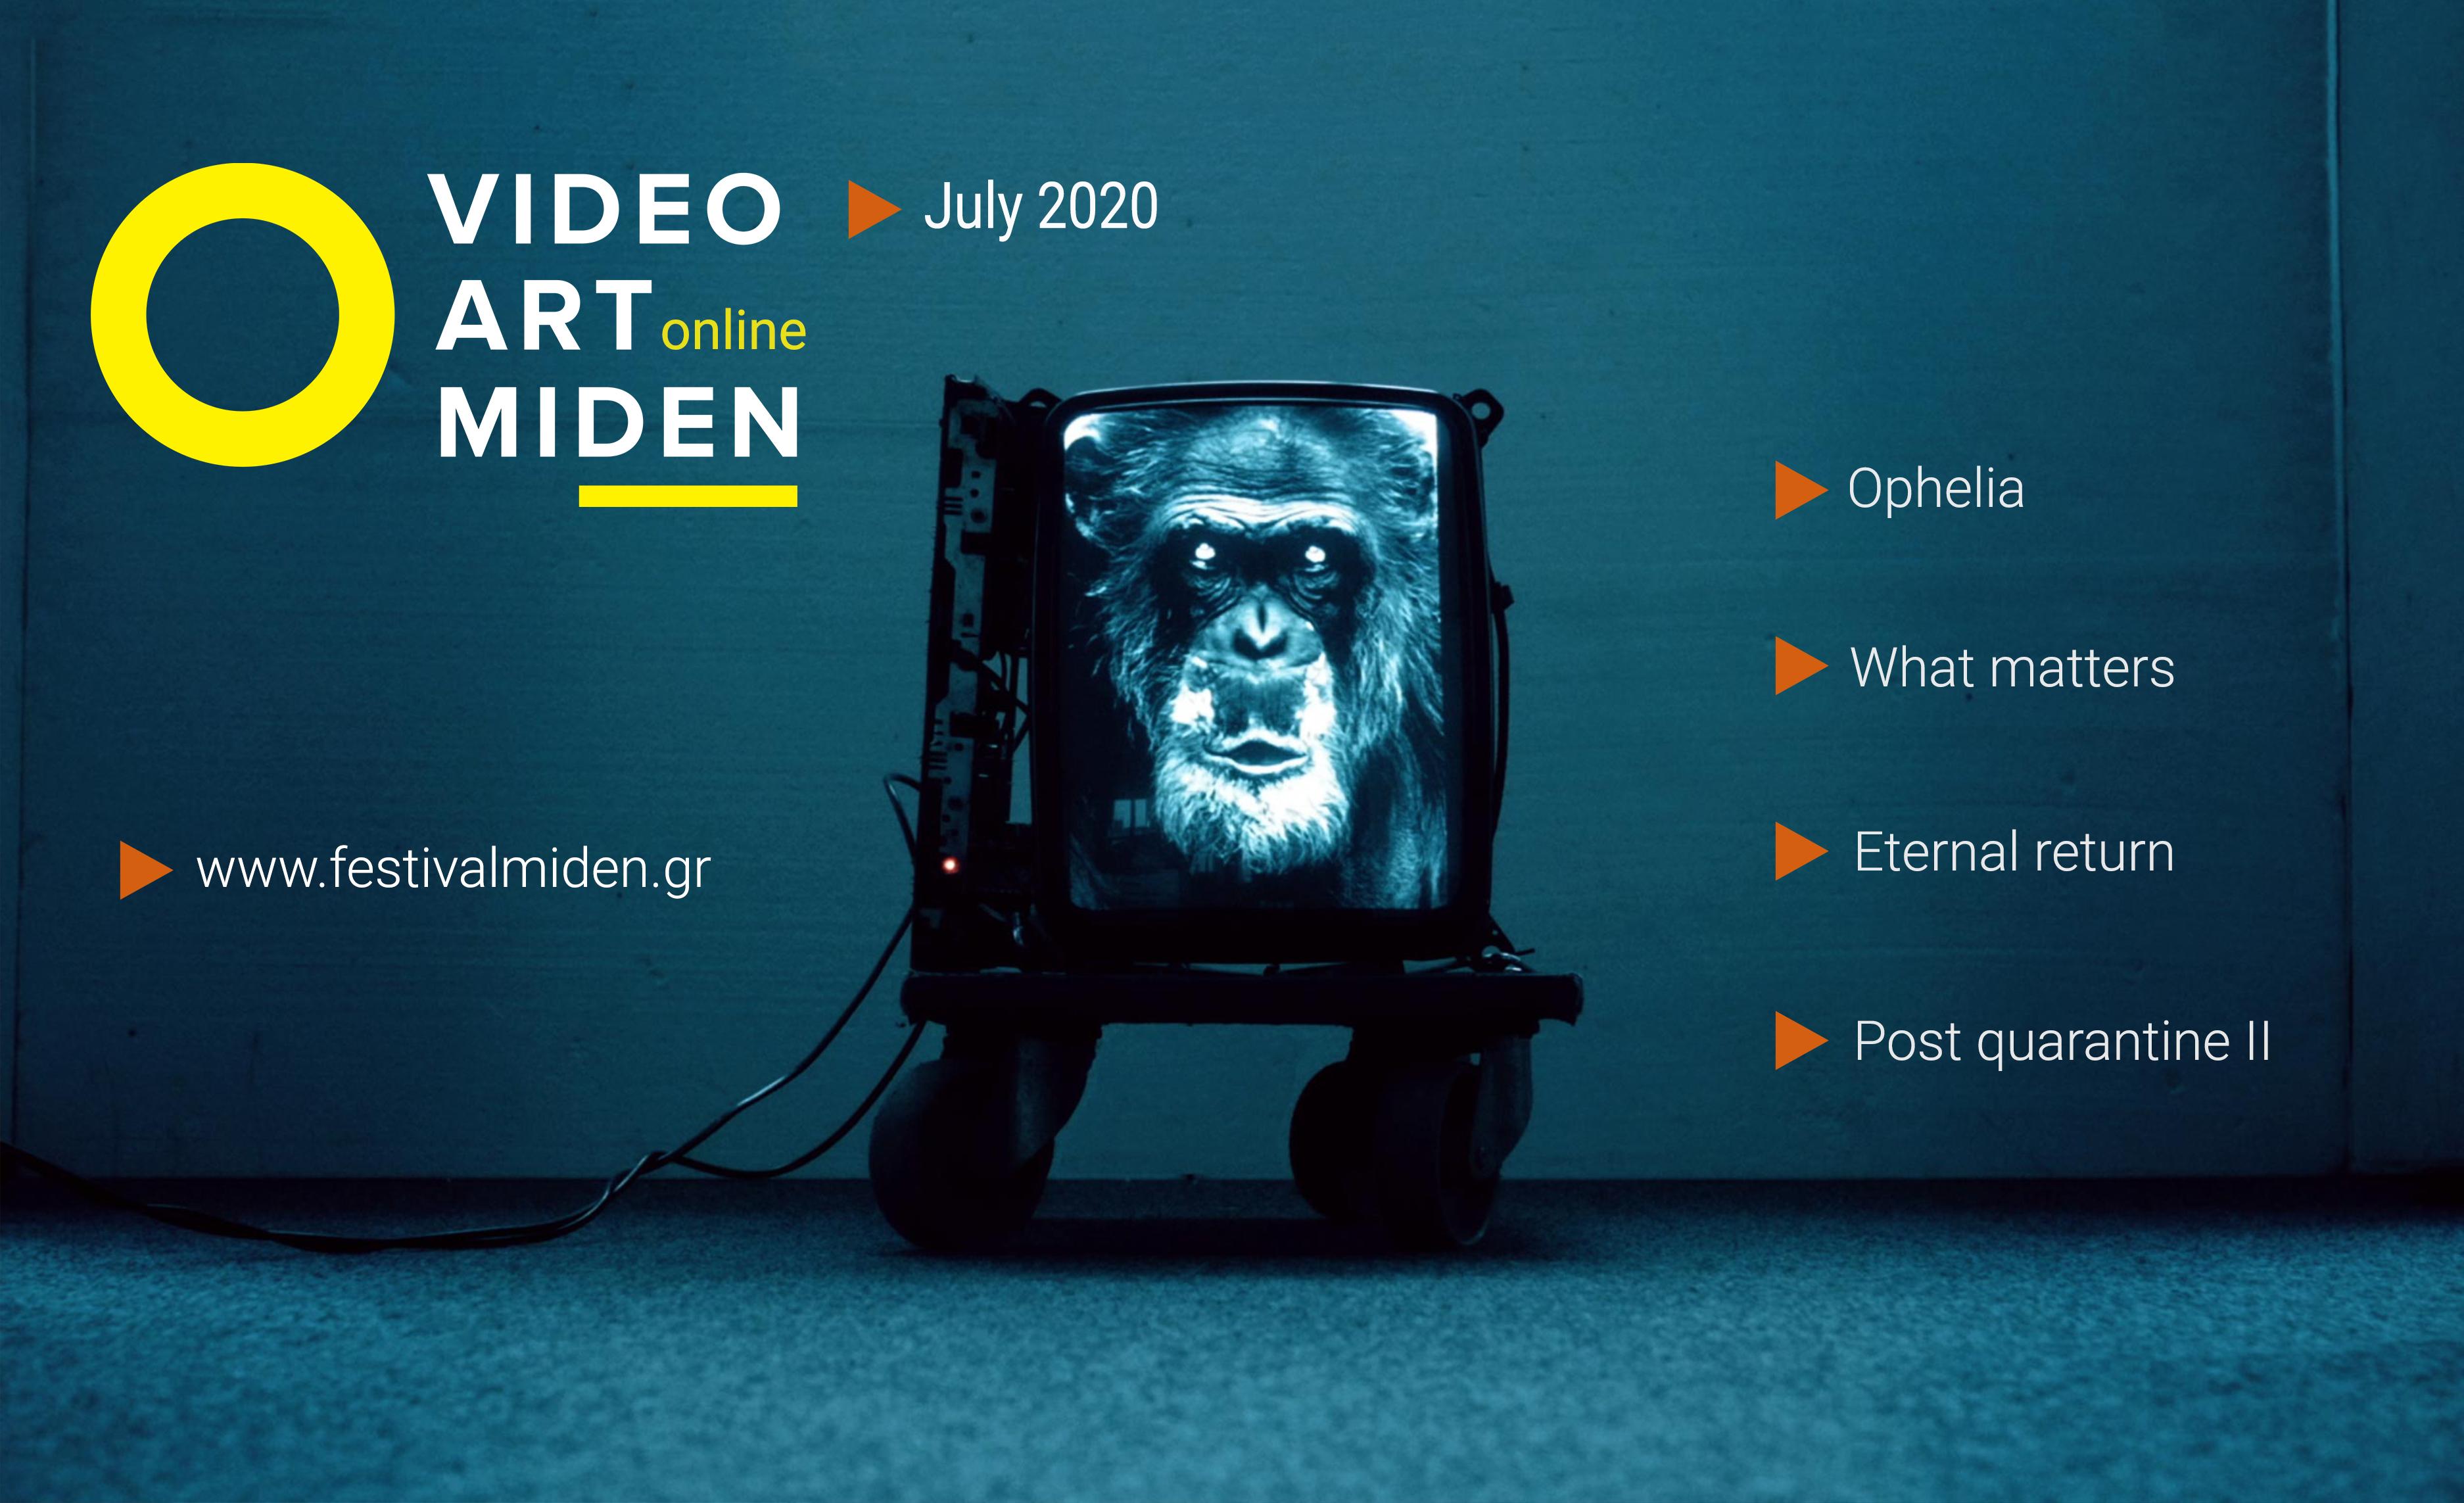 Video_Art_Miden_July2020